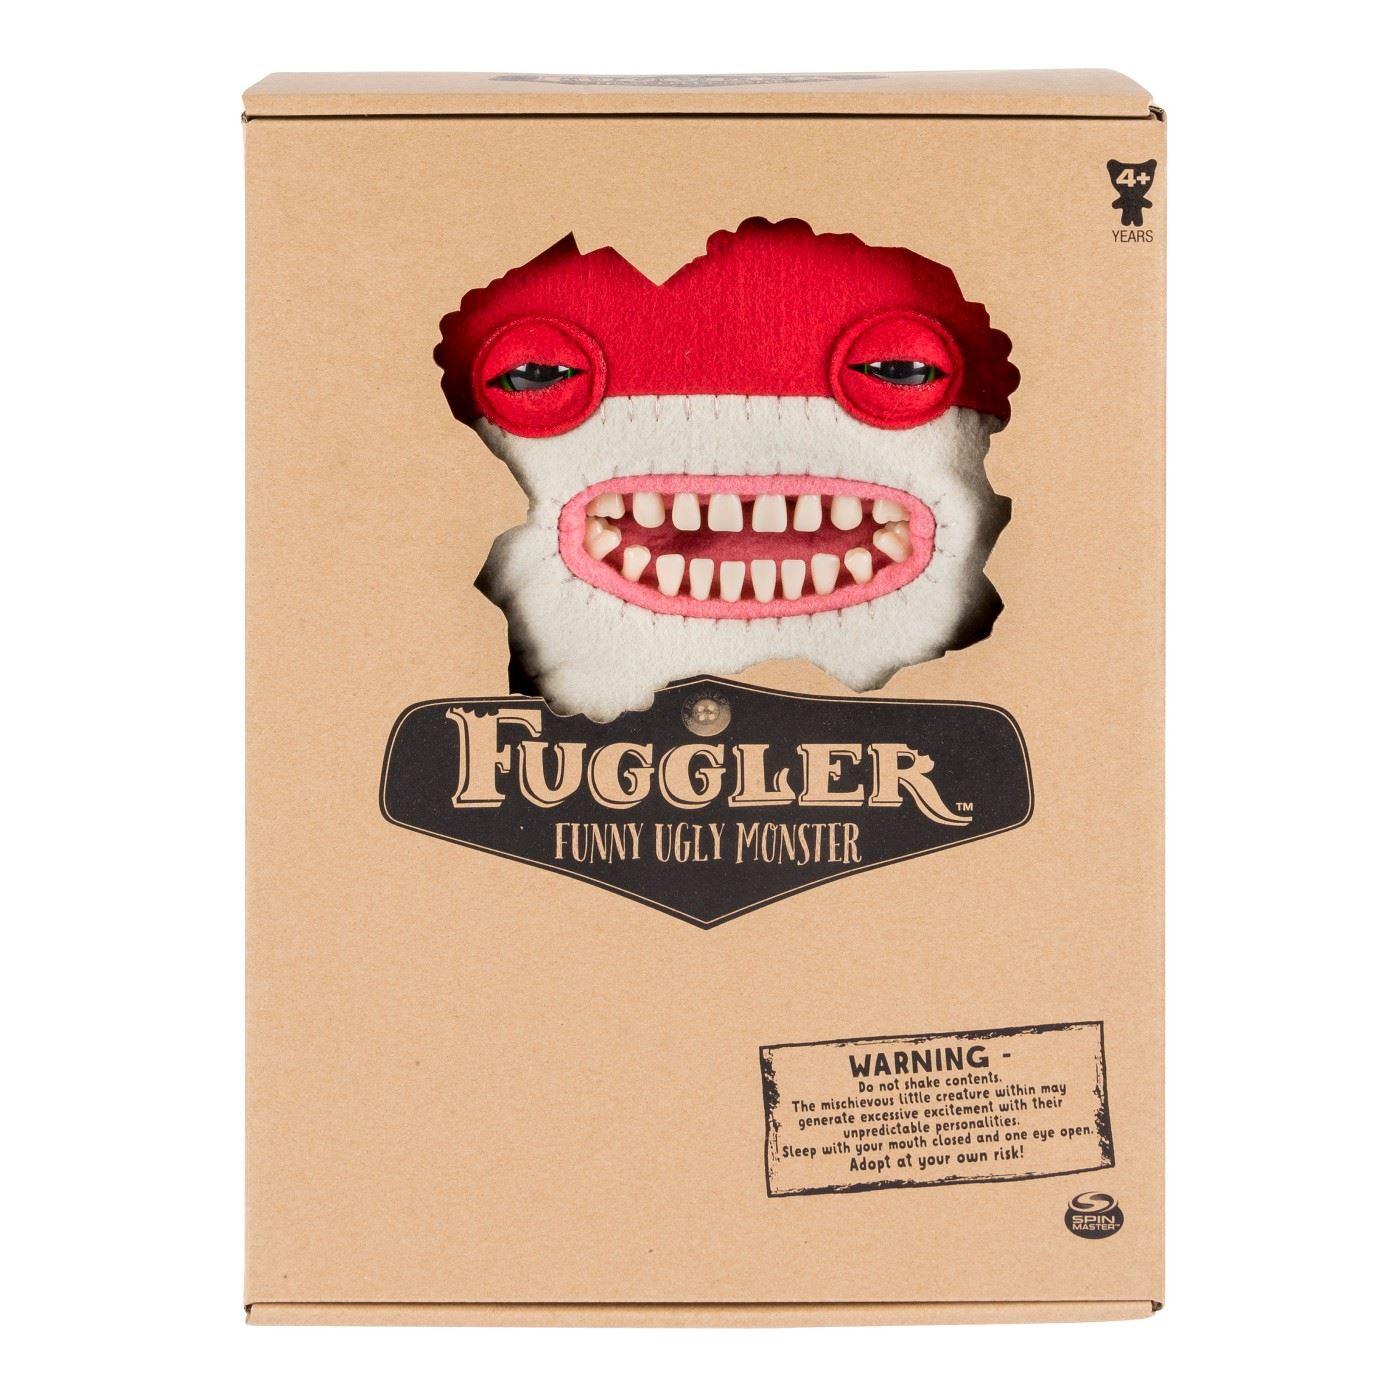 Fuggler-Funny-Uggly-Monsters-Blue-Red-Purple-Light-Red-Stuffed-Animal 縮圖 9